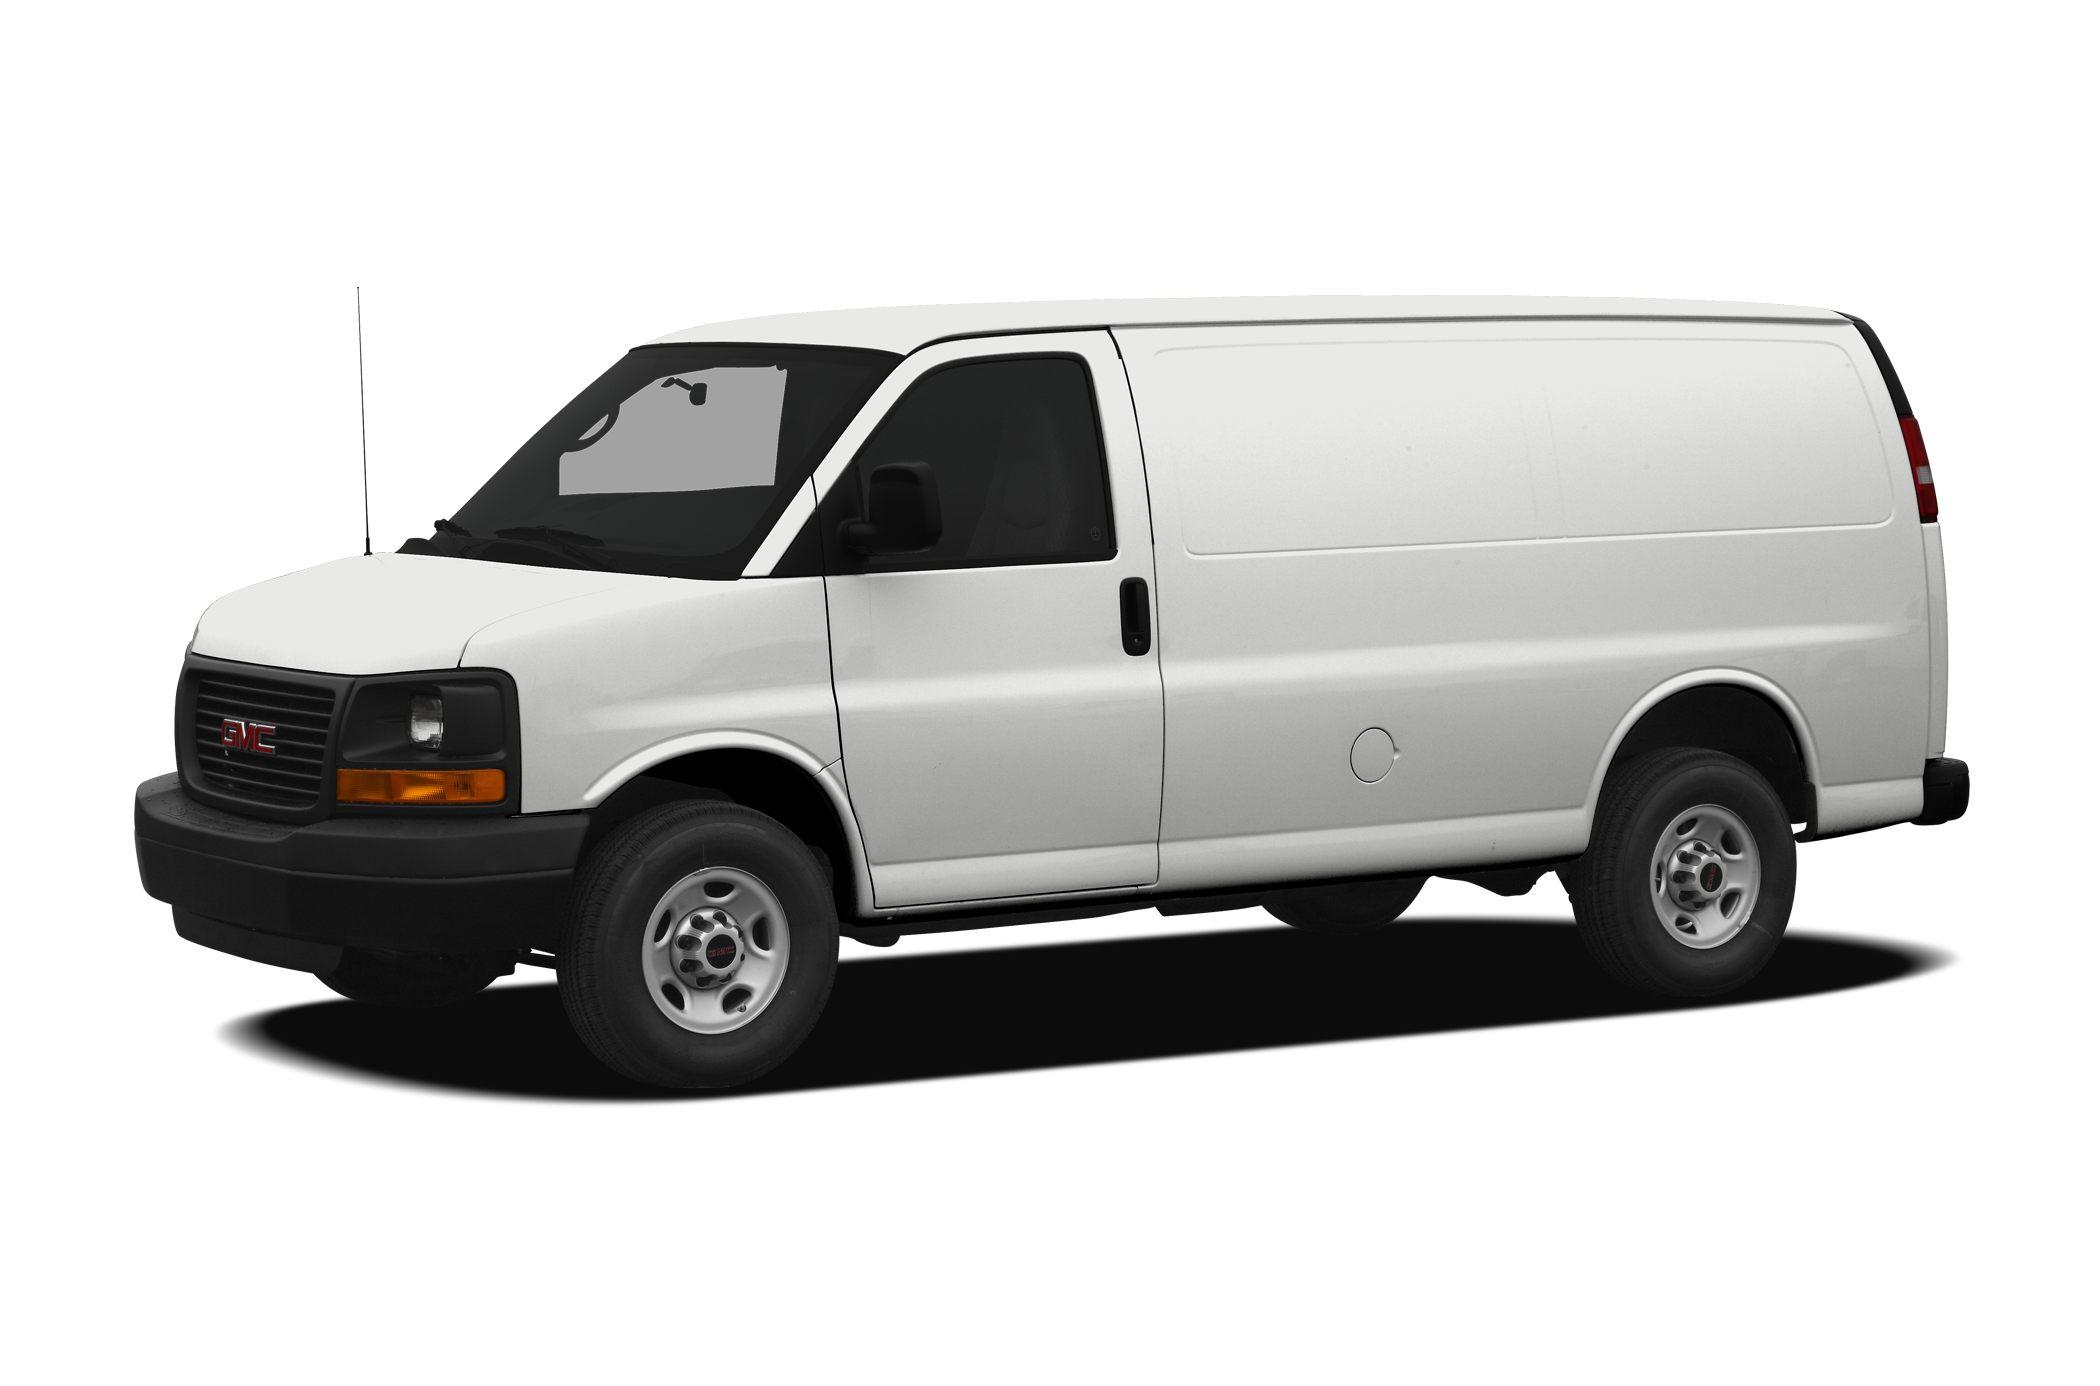 2010 GMC Savana 1500 Cargo Van for sale in Doylestown for $36,985 with 67,780 miles.